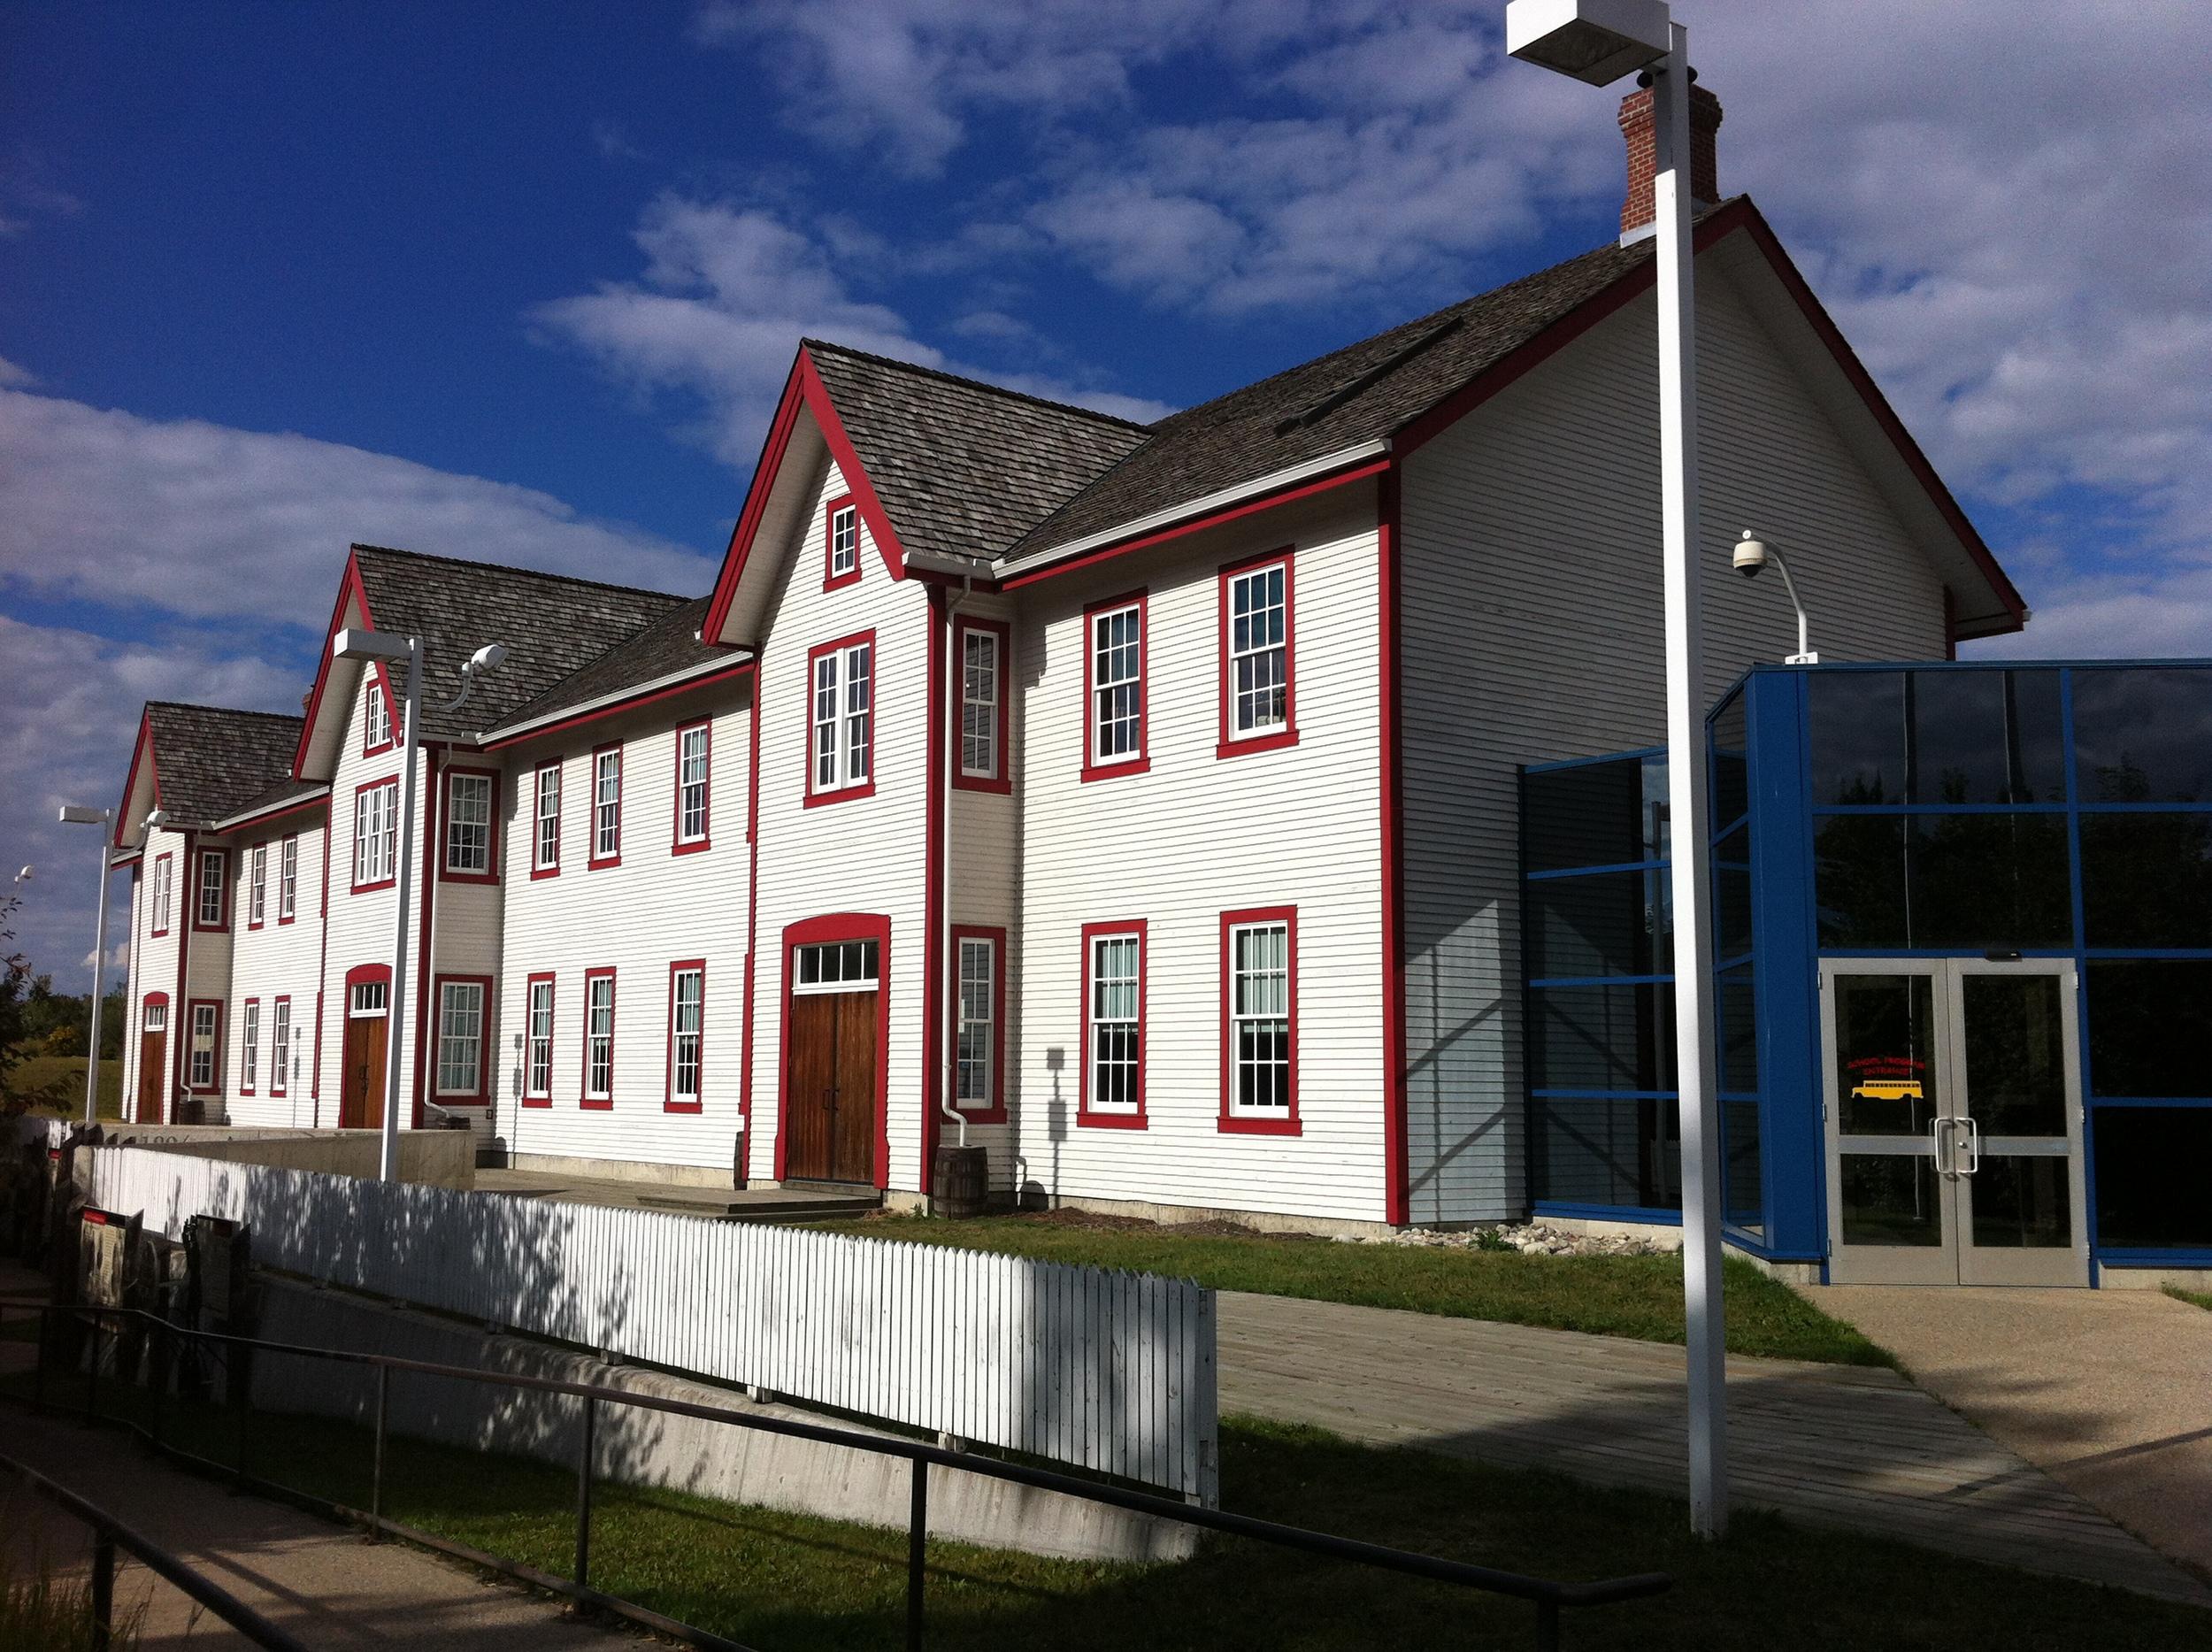 The Barracks building.